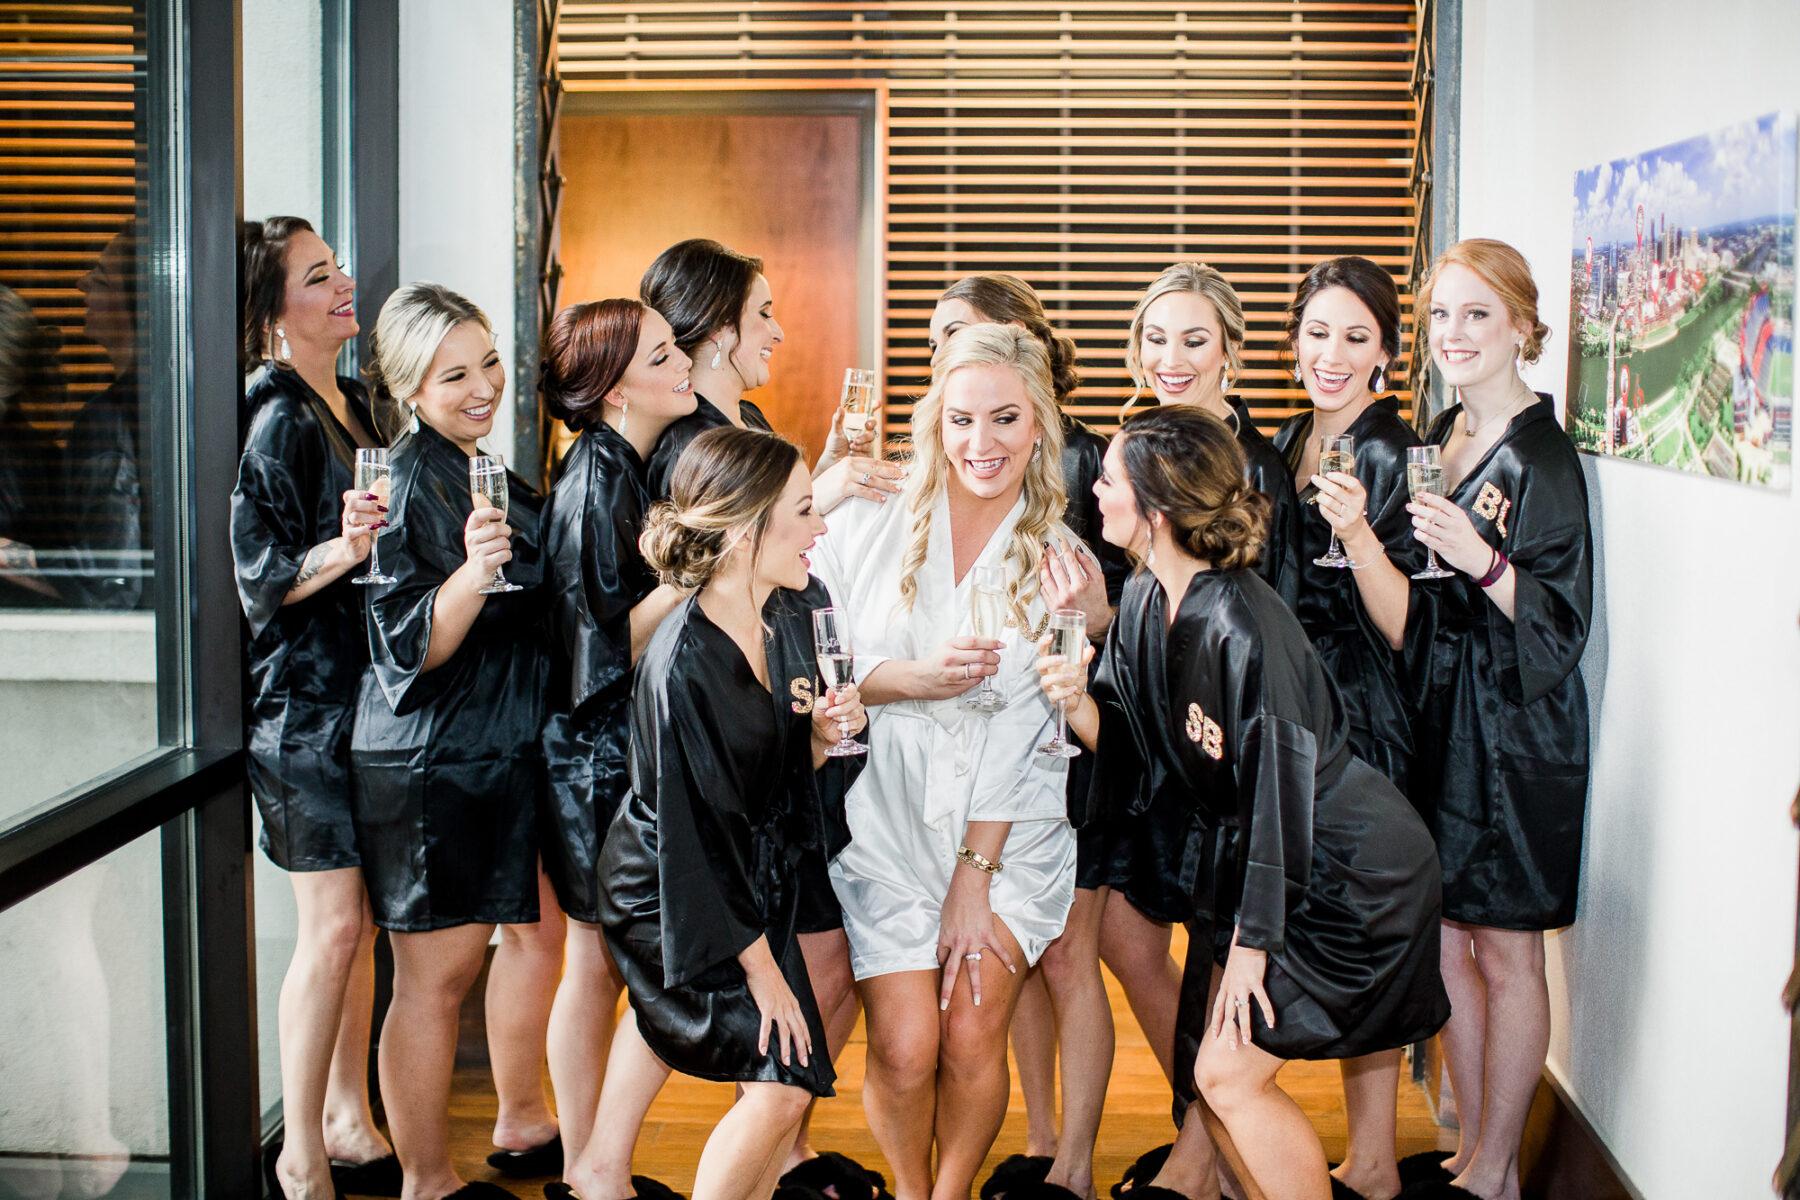 Bridal Party Photo Ideas | Nashville Bride Guide